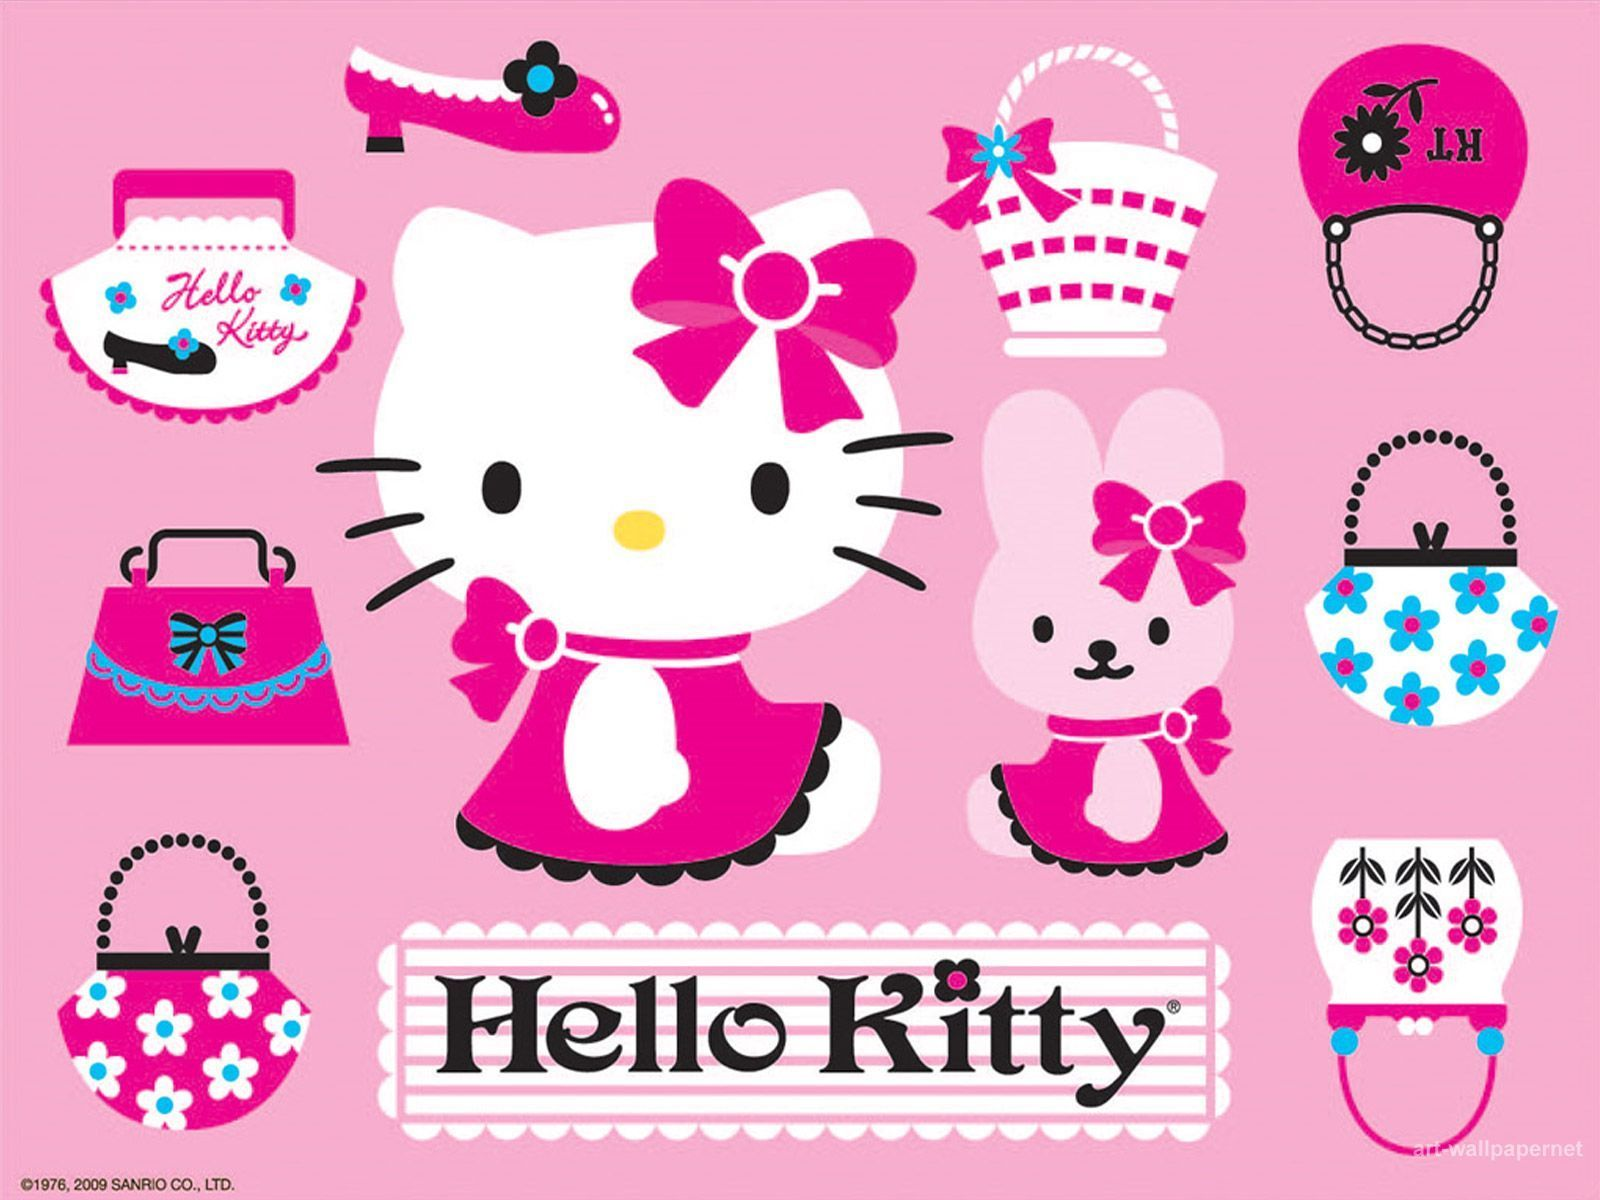 Download Gambar Wallpaper Hello Kitty Kampung Wallpaper